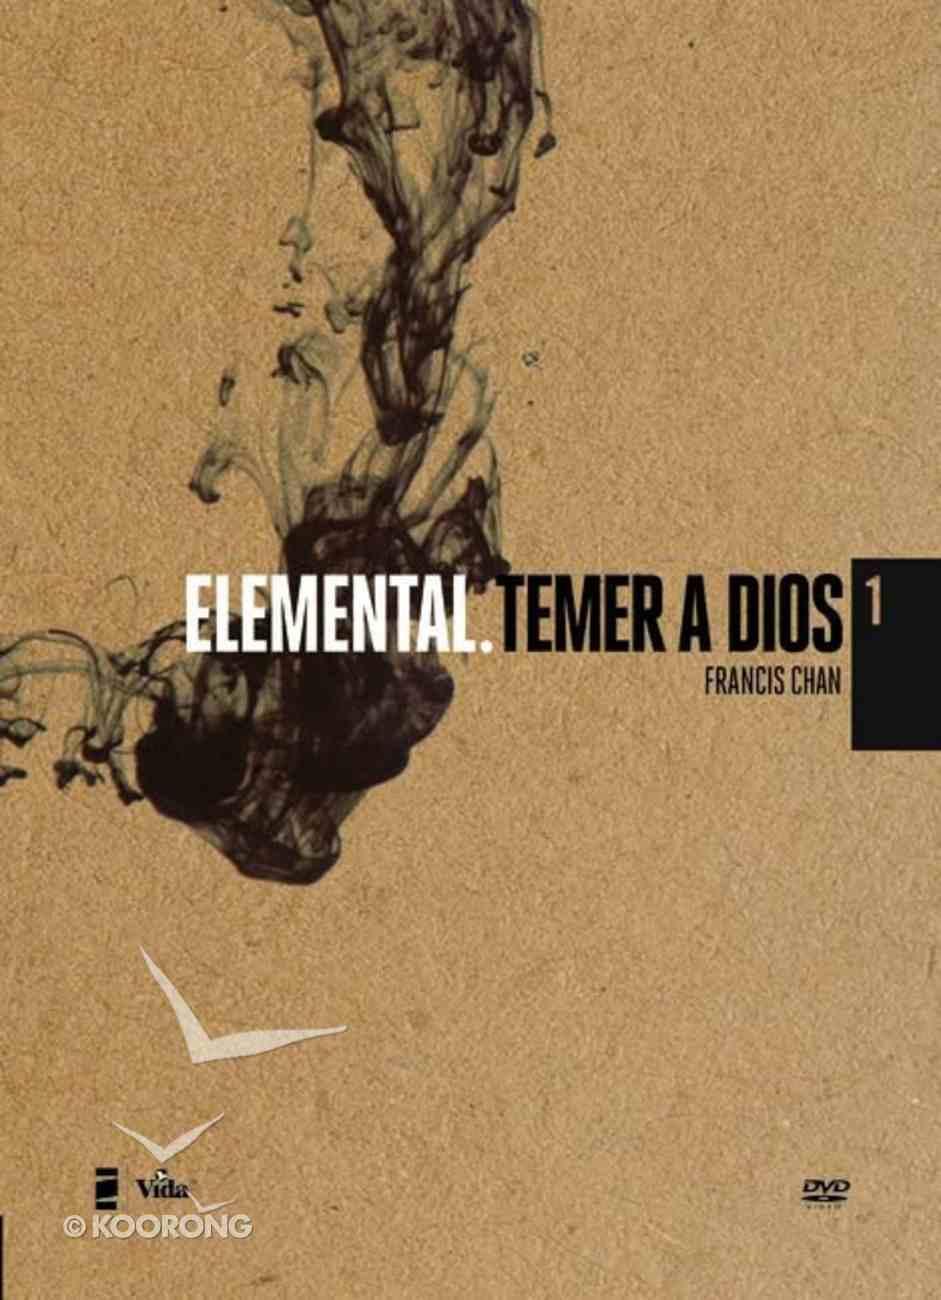 Elemental Temor De Dios (Basic: Fear of God) (Volume 1) (#01 in Basic. Dvd Series) DVD